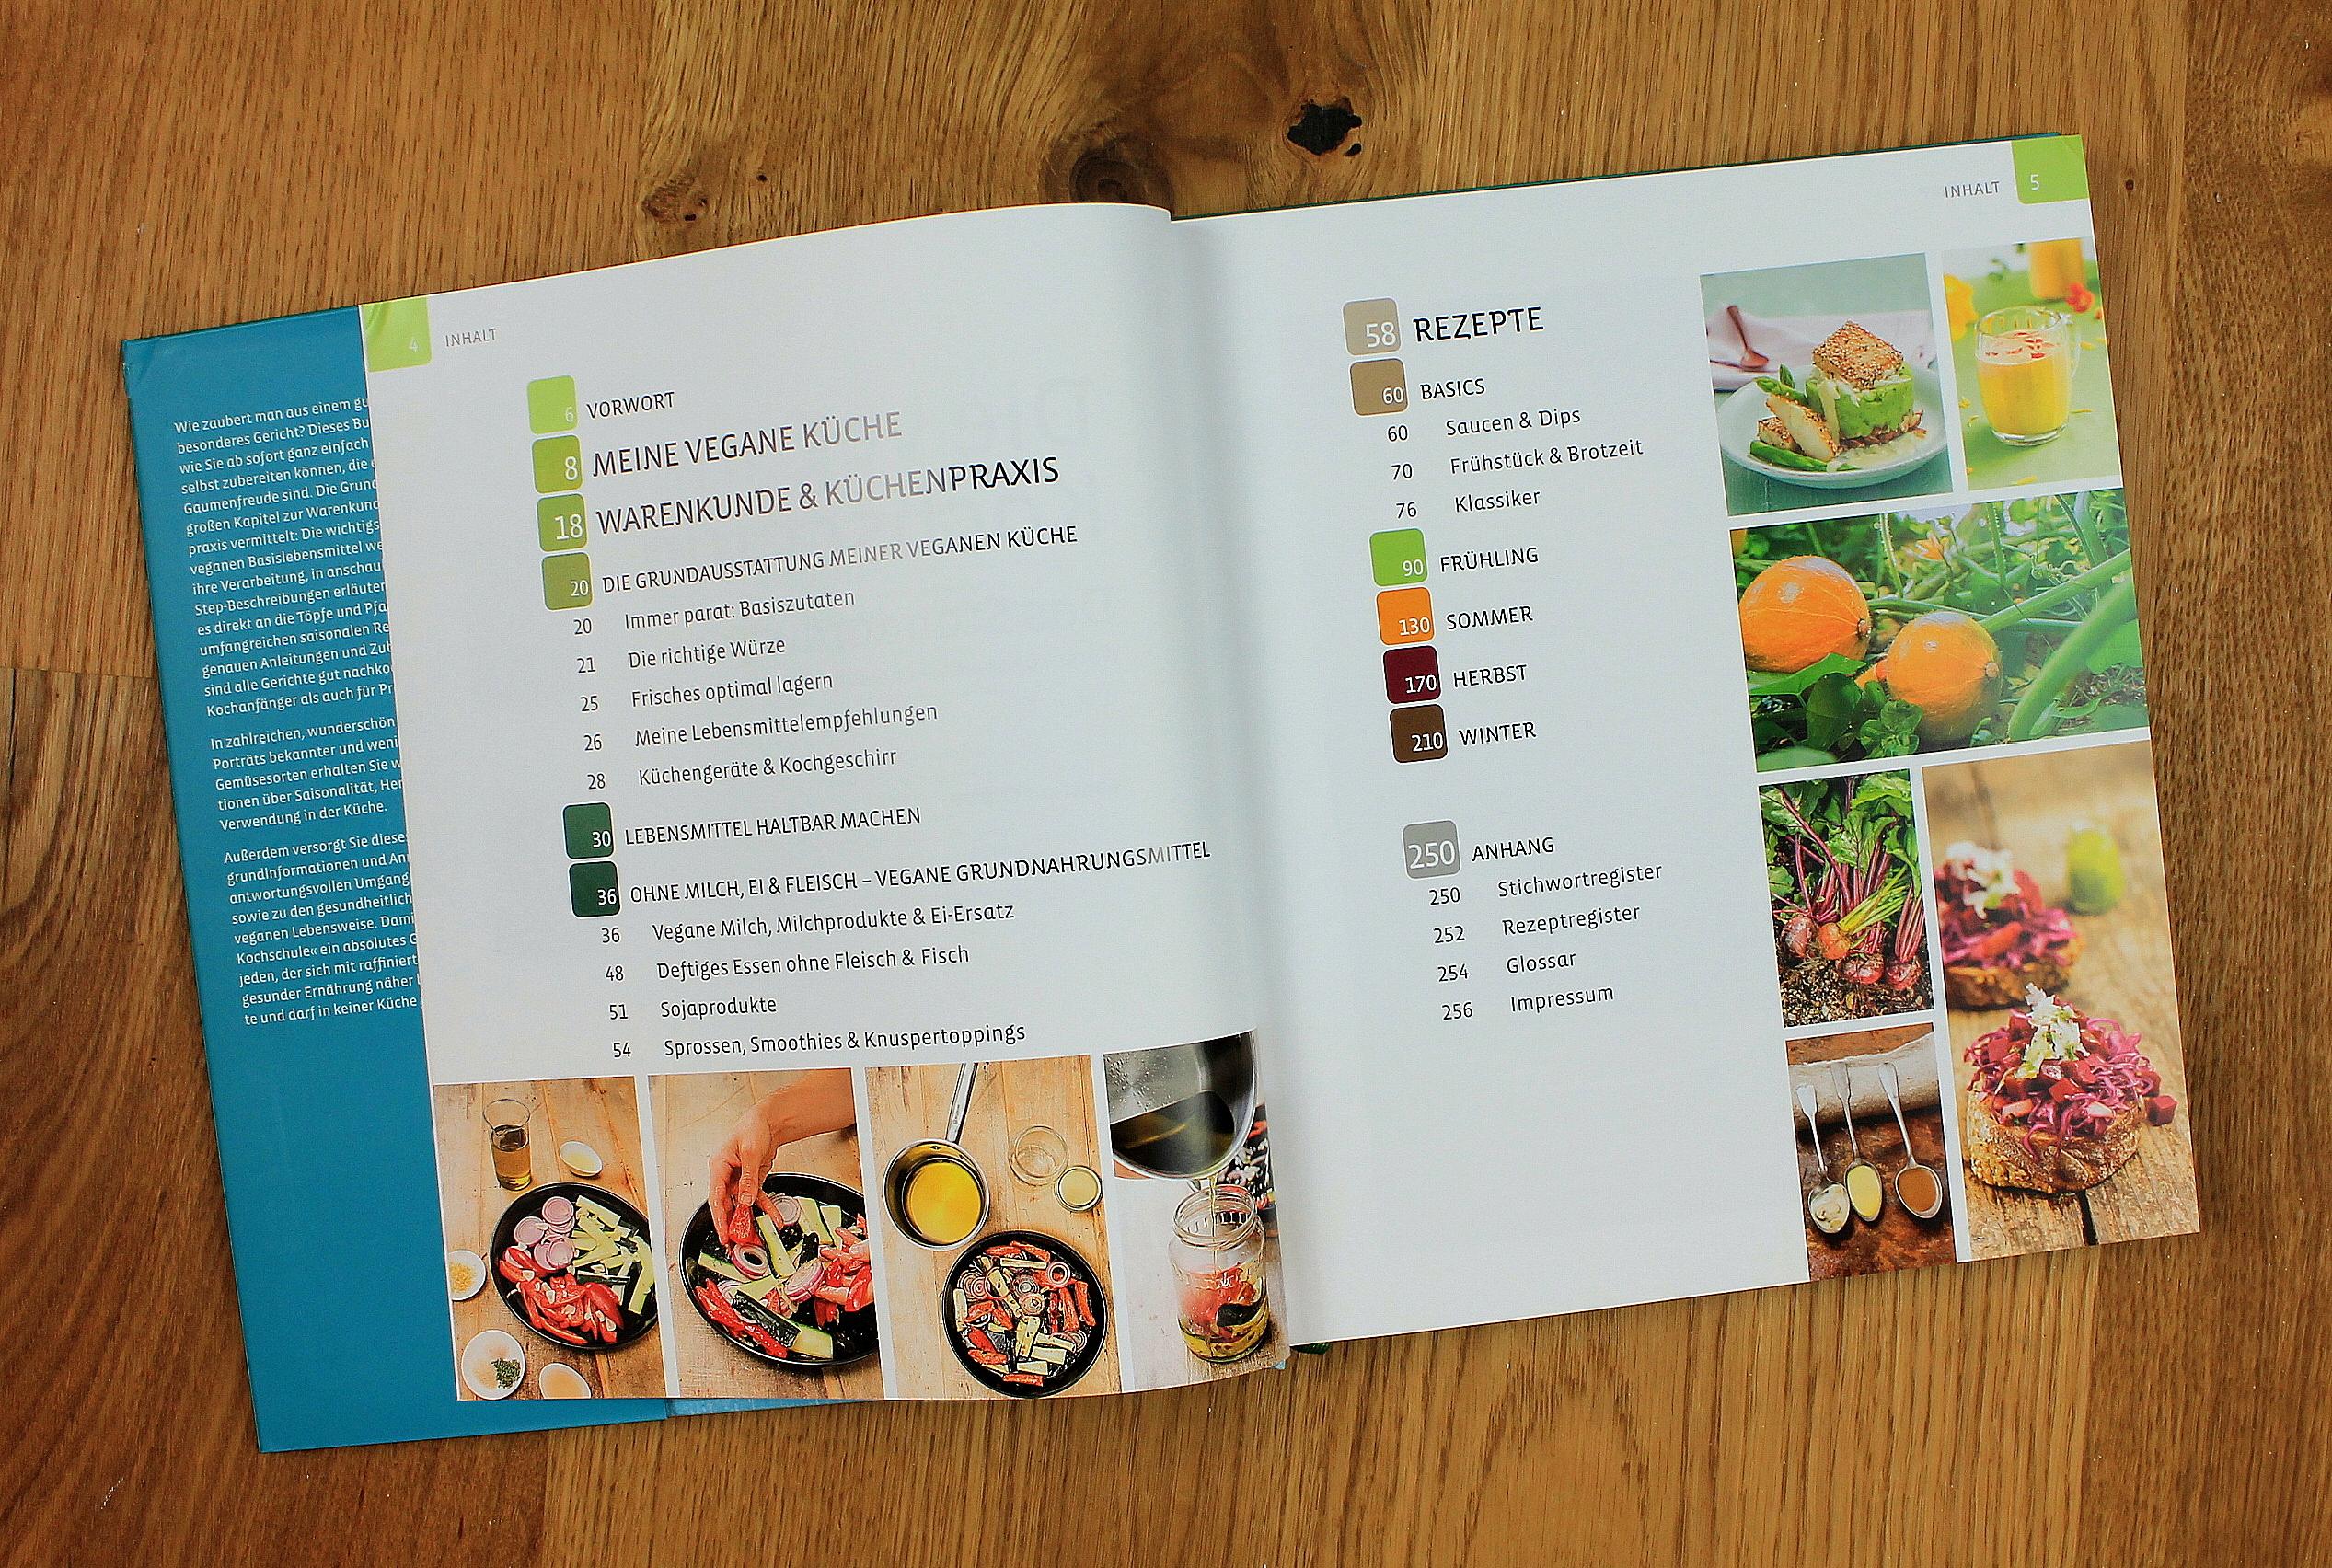 Die vegane Kochschule - Küchenpraxis · Warenkunde · 200 Rezepte\